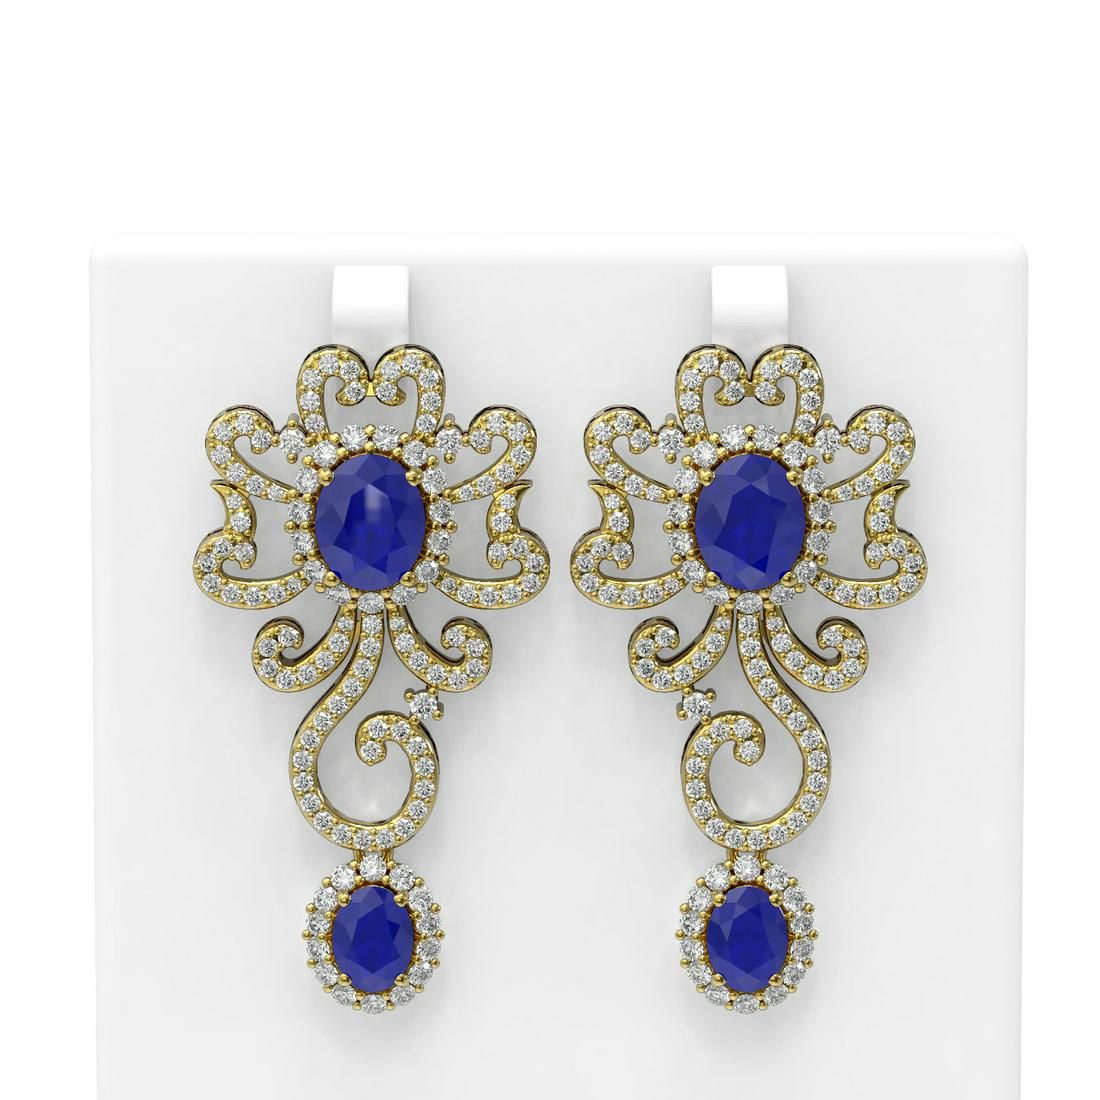 16.75 ctw Sapphire & Diamond Earrings 18K Yellow Gold -